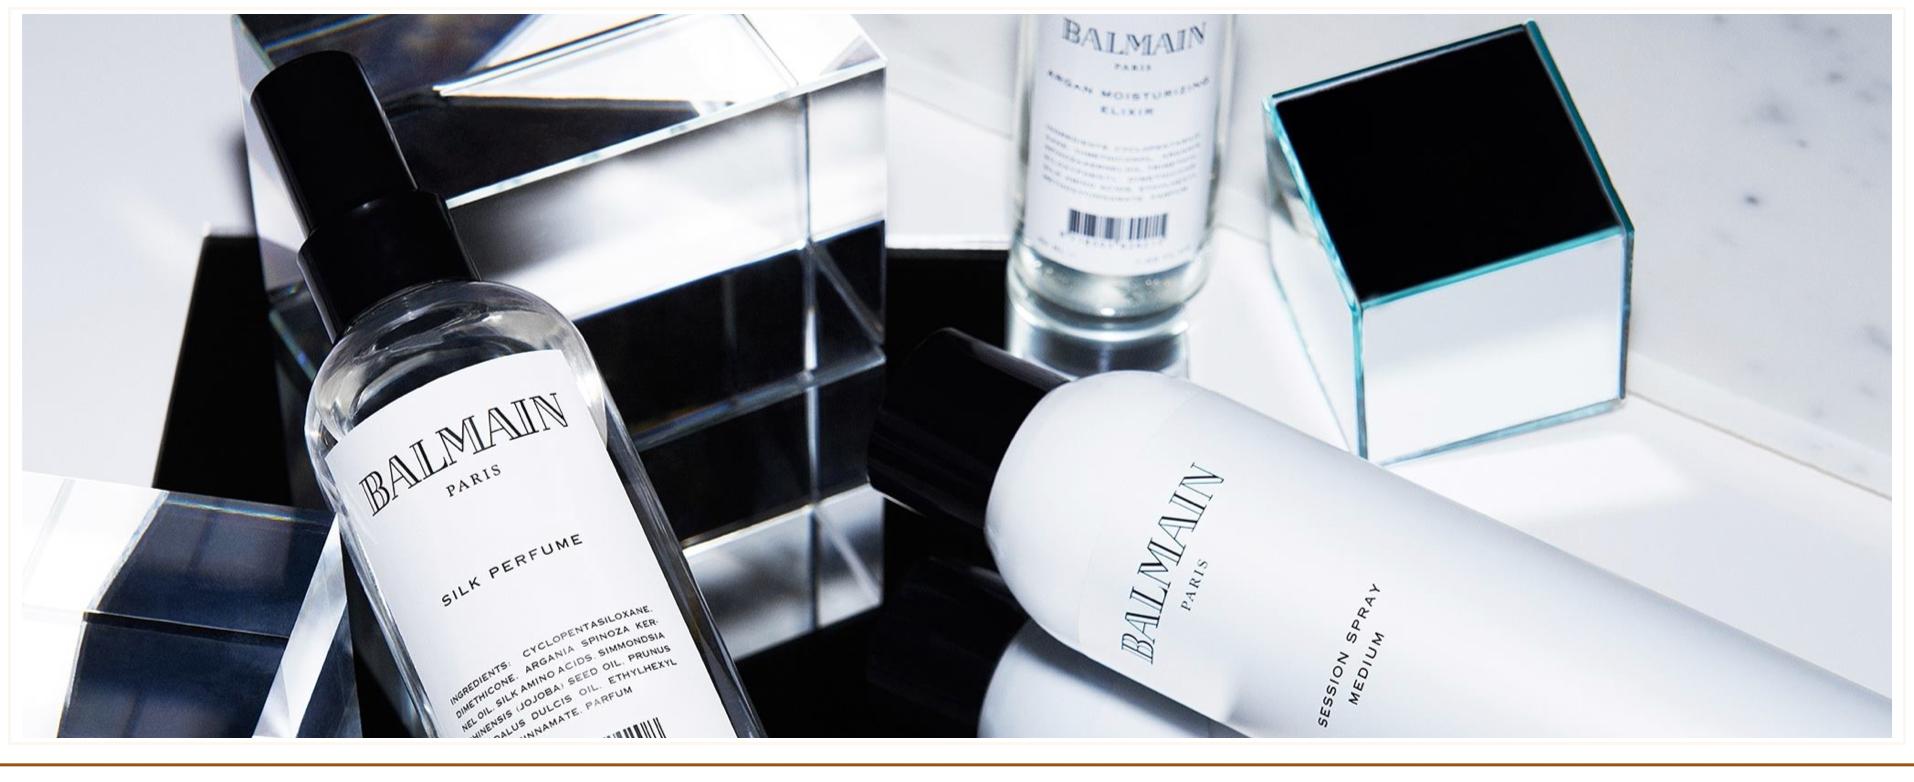 produktwelt balmain paris hair couture schnellbach palais gmbh intercoiffure. Black Bedroom Furniture Sets. Home Design Ideas